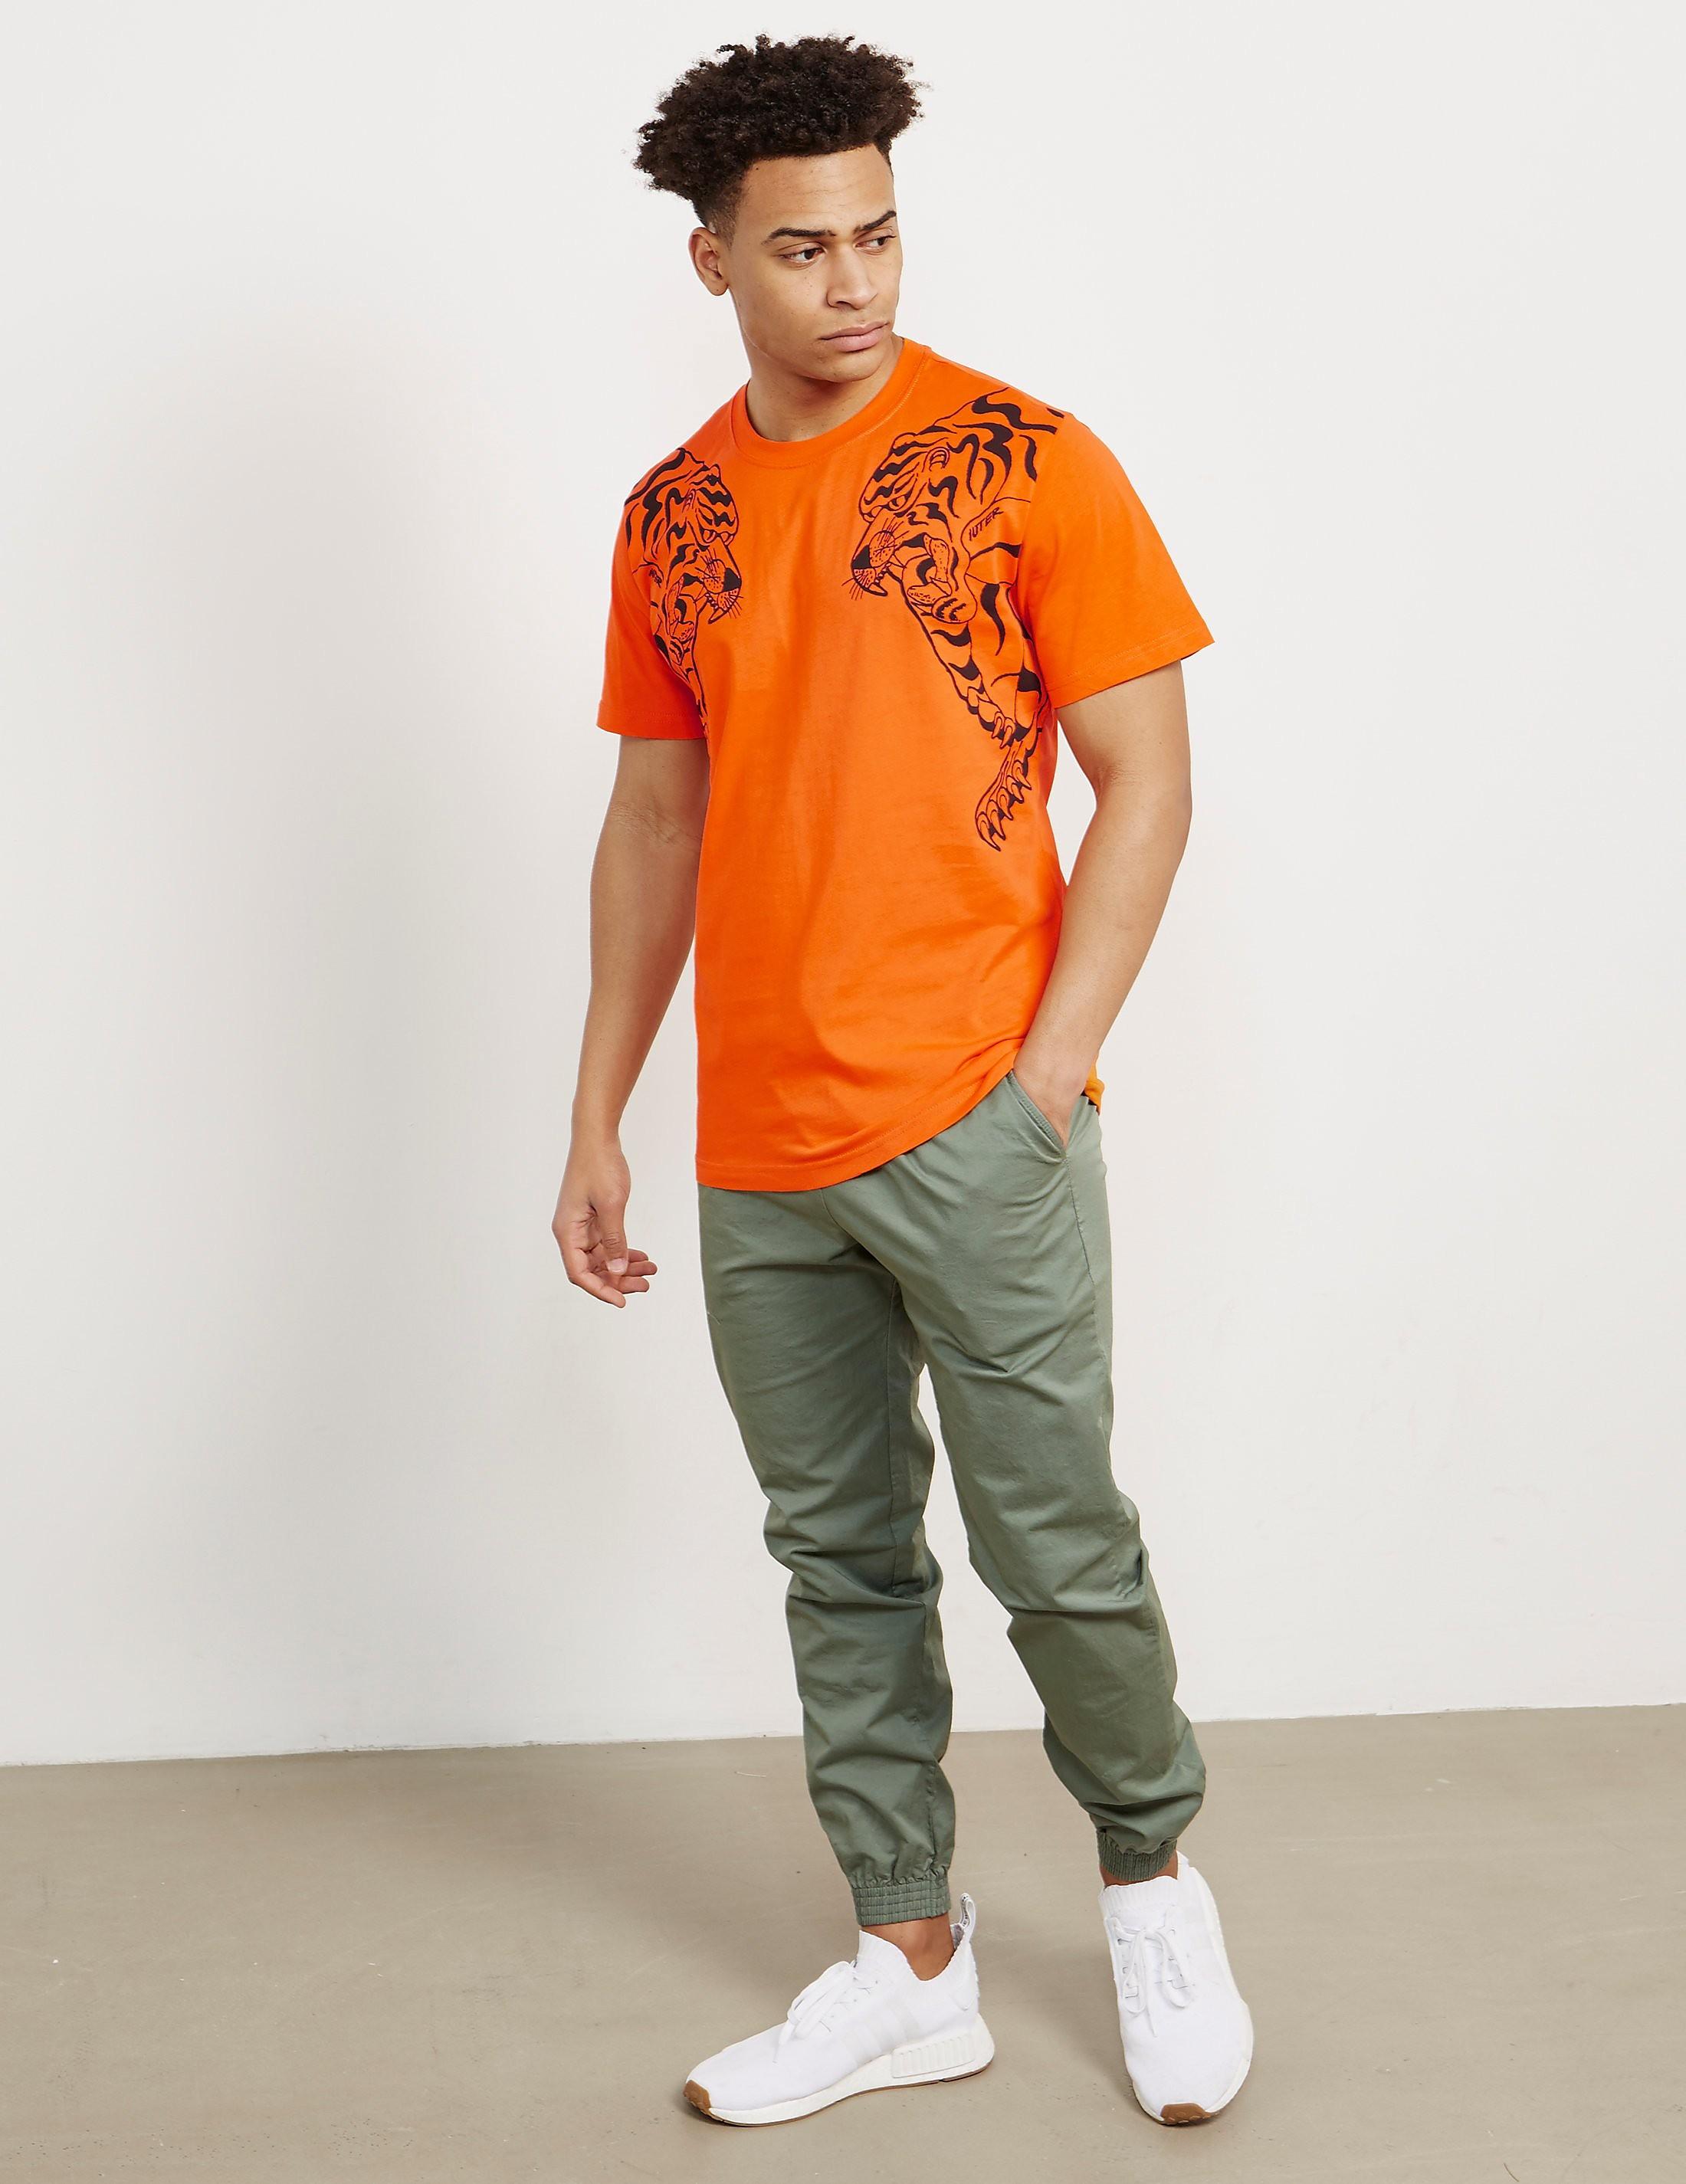 IUTER Nepal Short Sleeve T-Shirt - Exclusive